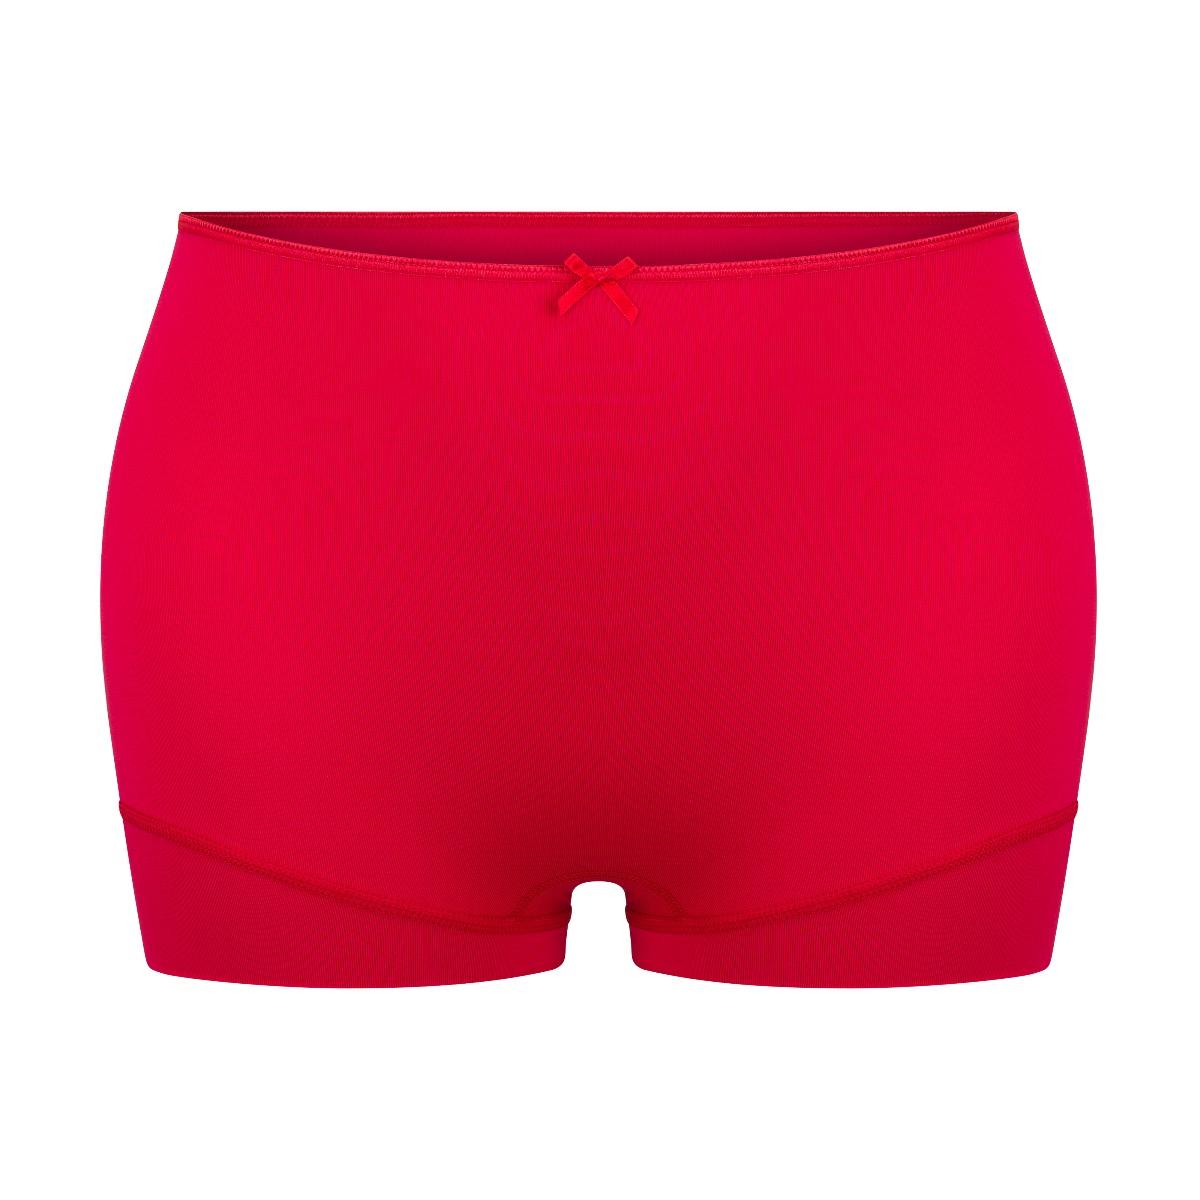 RJ Pure Color Dames Short Extra Hoog Donkerrood XL